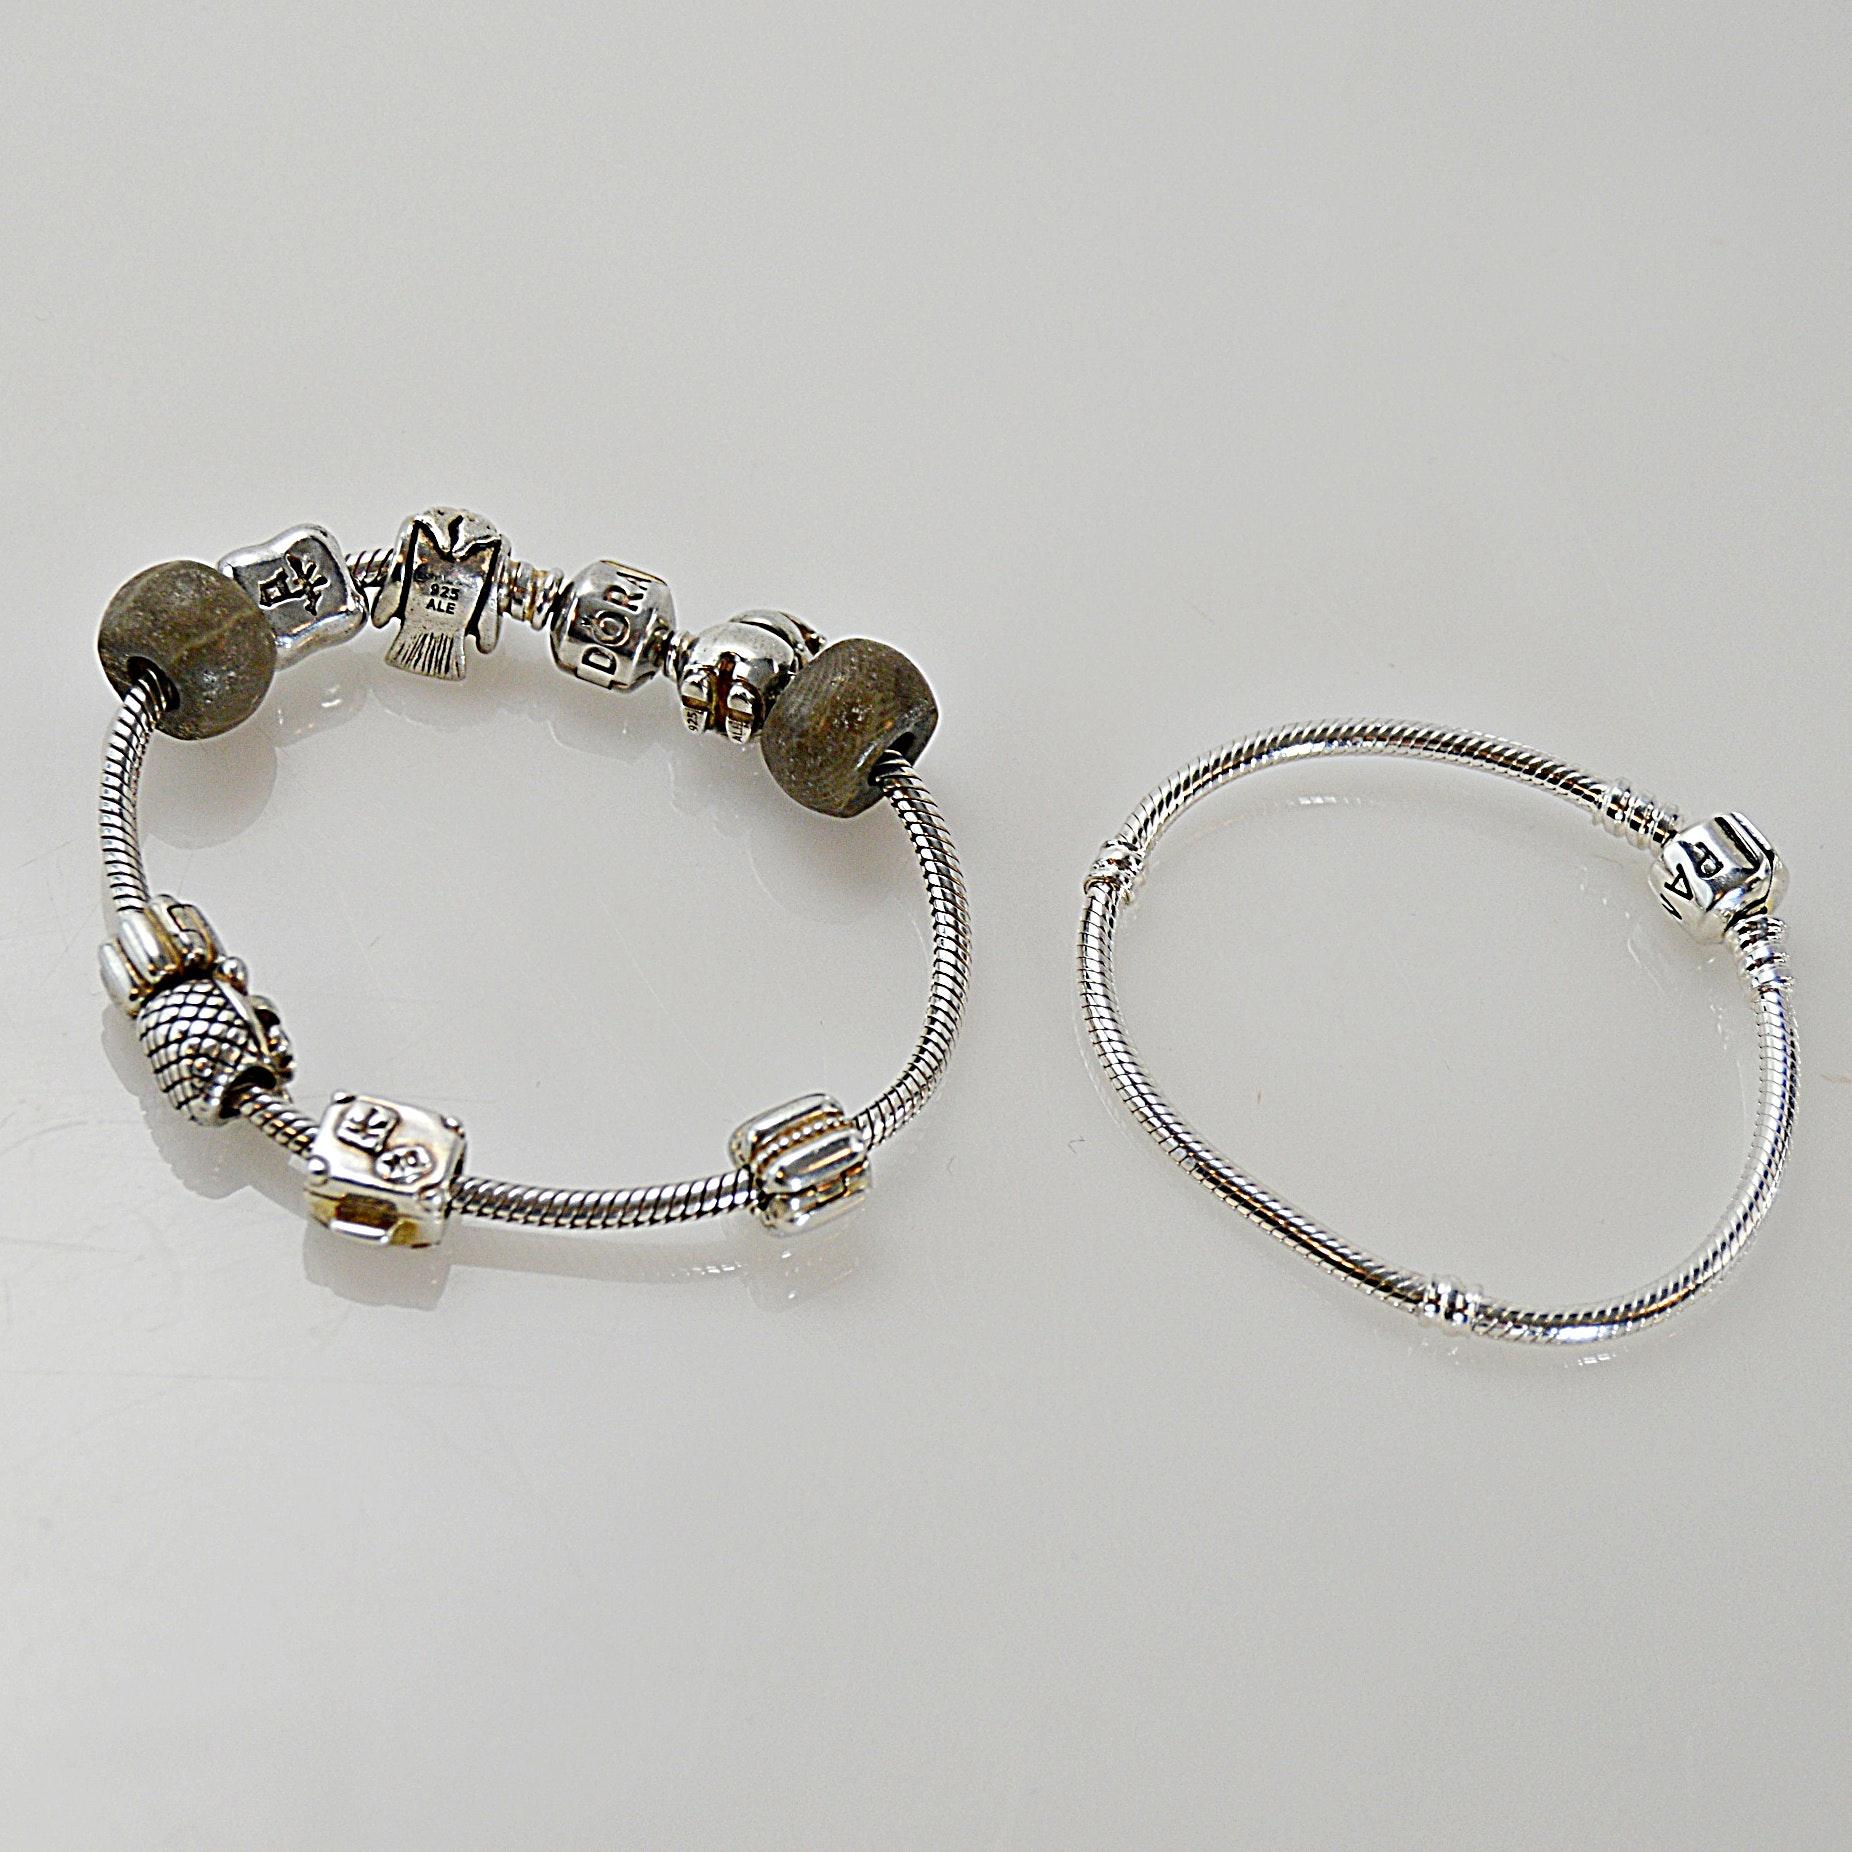 Two Pandora Sterling Silver Bracelets